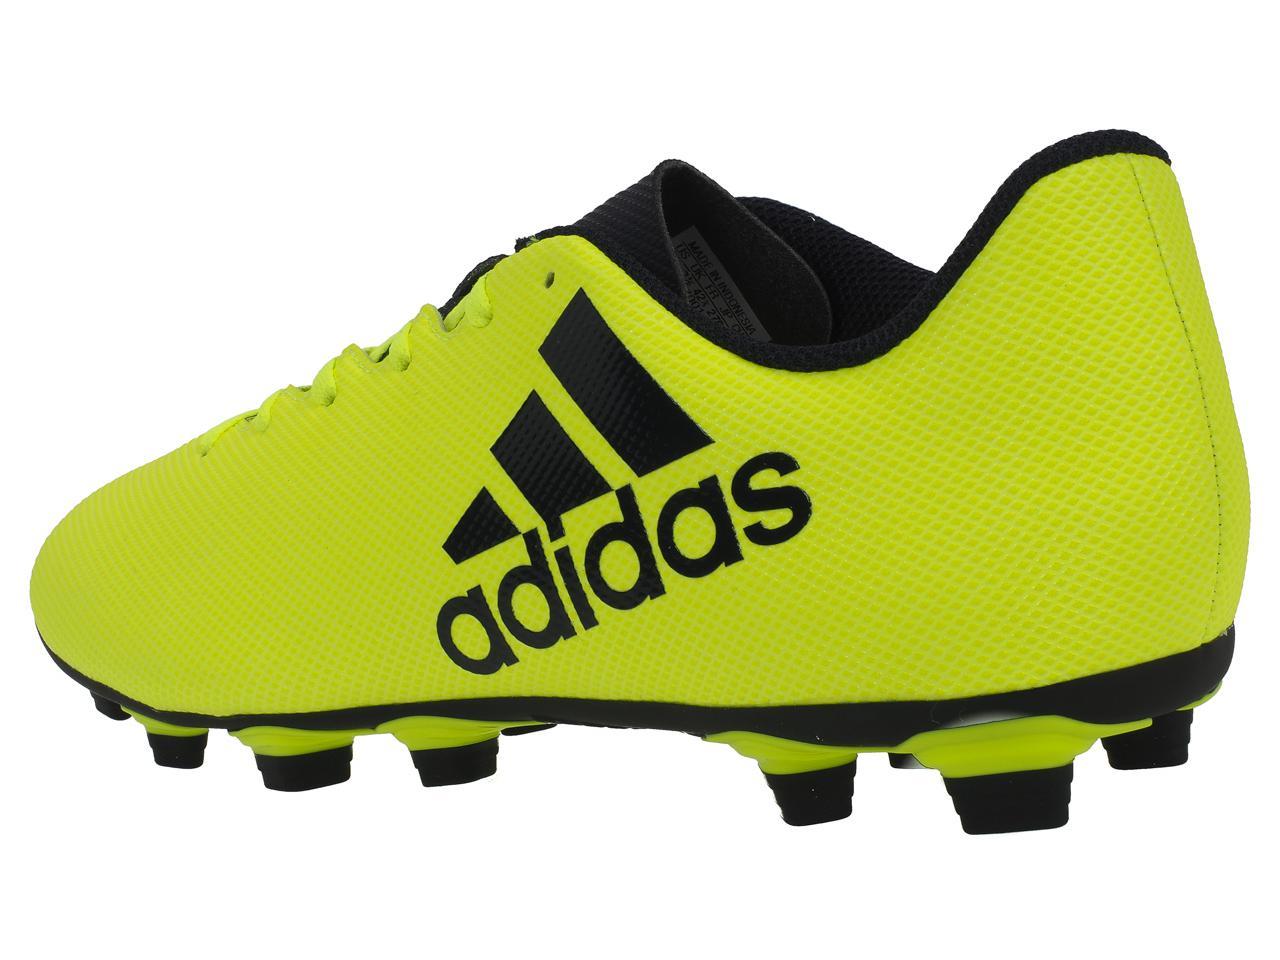 Chaussures-football-moulees-Adidas-X-17-4-fxg-Jaune-74837-Neuf